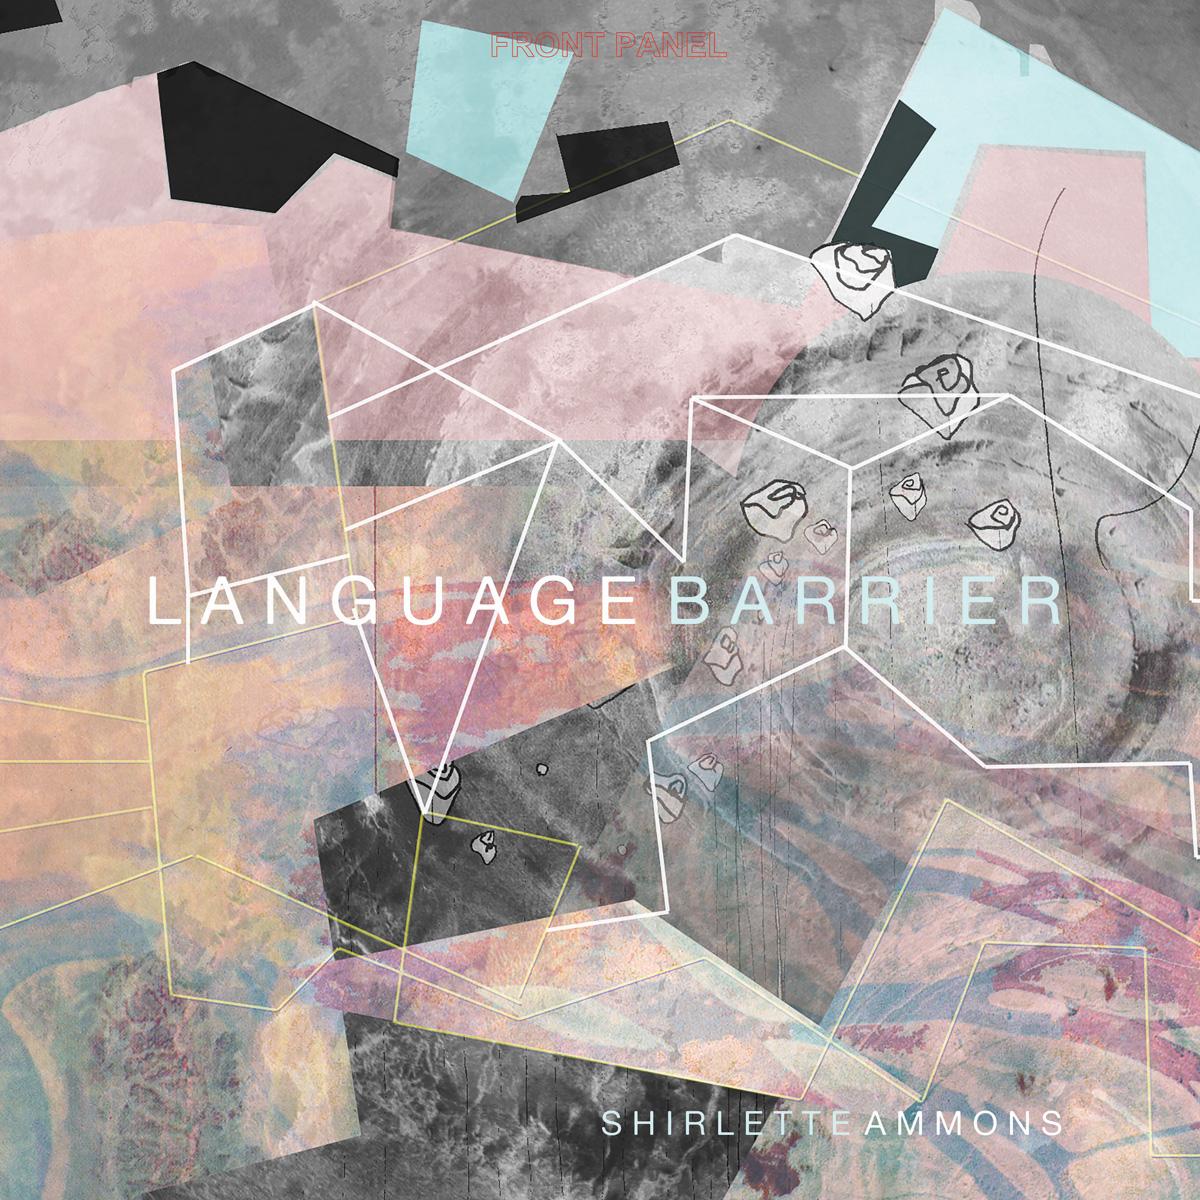 shirlette ammons - language barrier